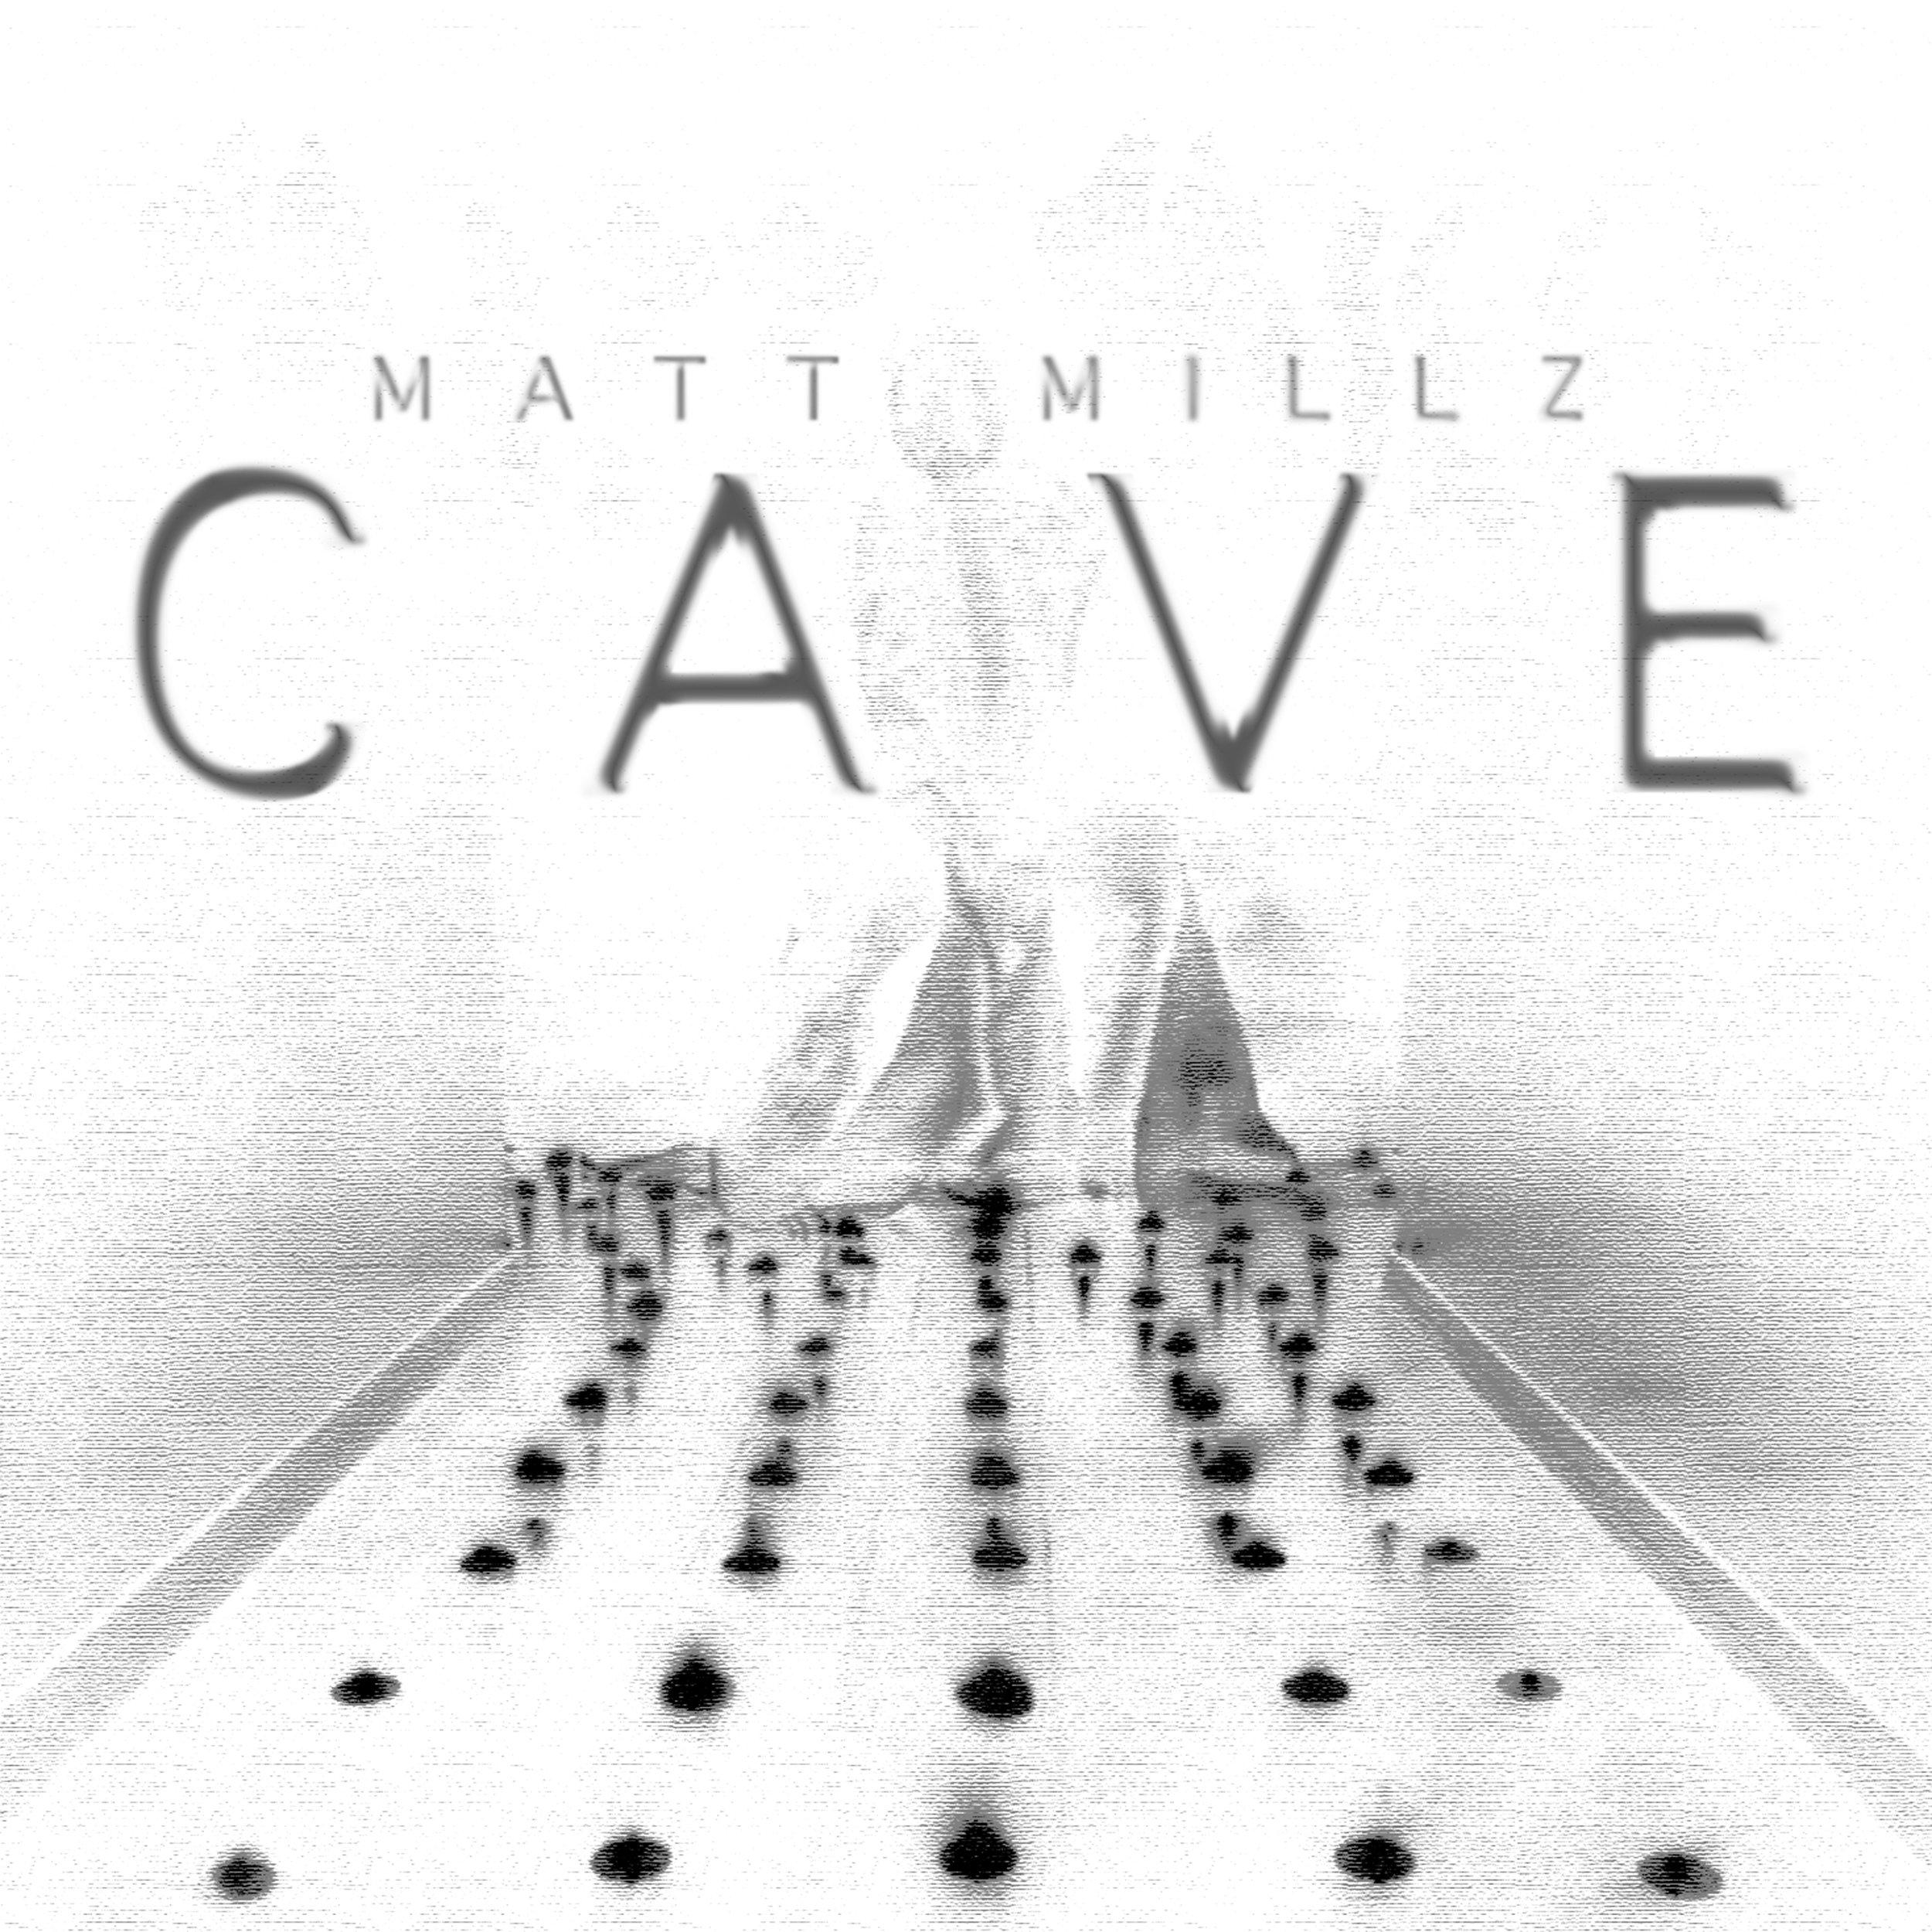 MATT MILLZ - CAVE     WRITING -  PRODUCING - ENGINEERING - MIXING